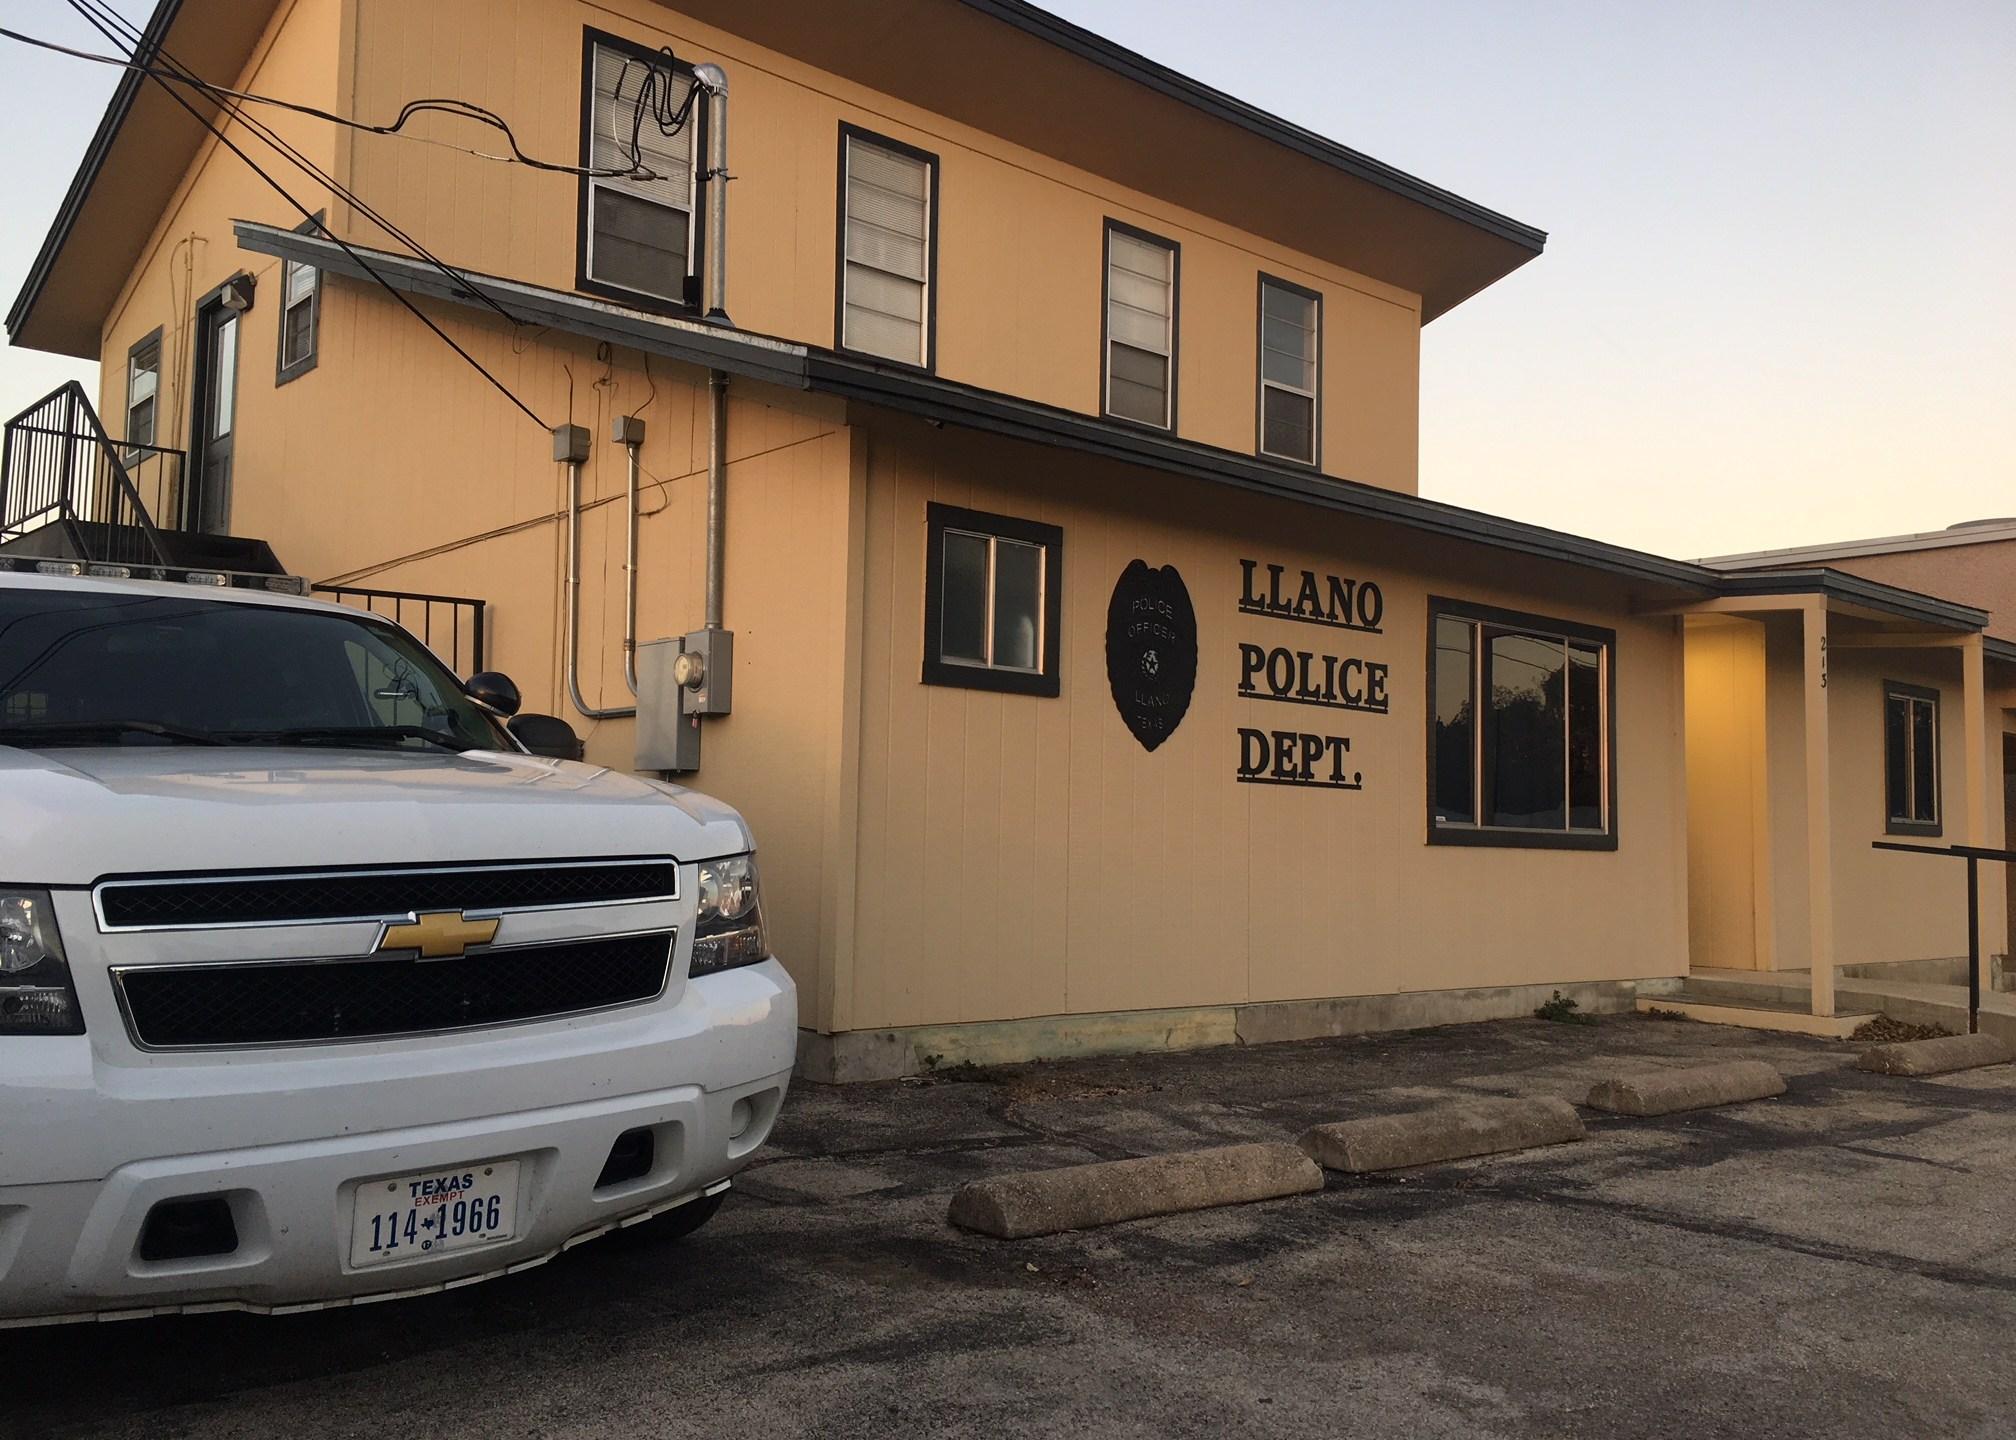 Llano Police Department_587004